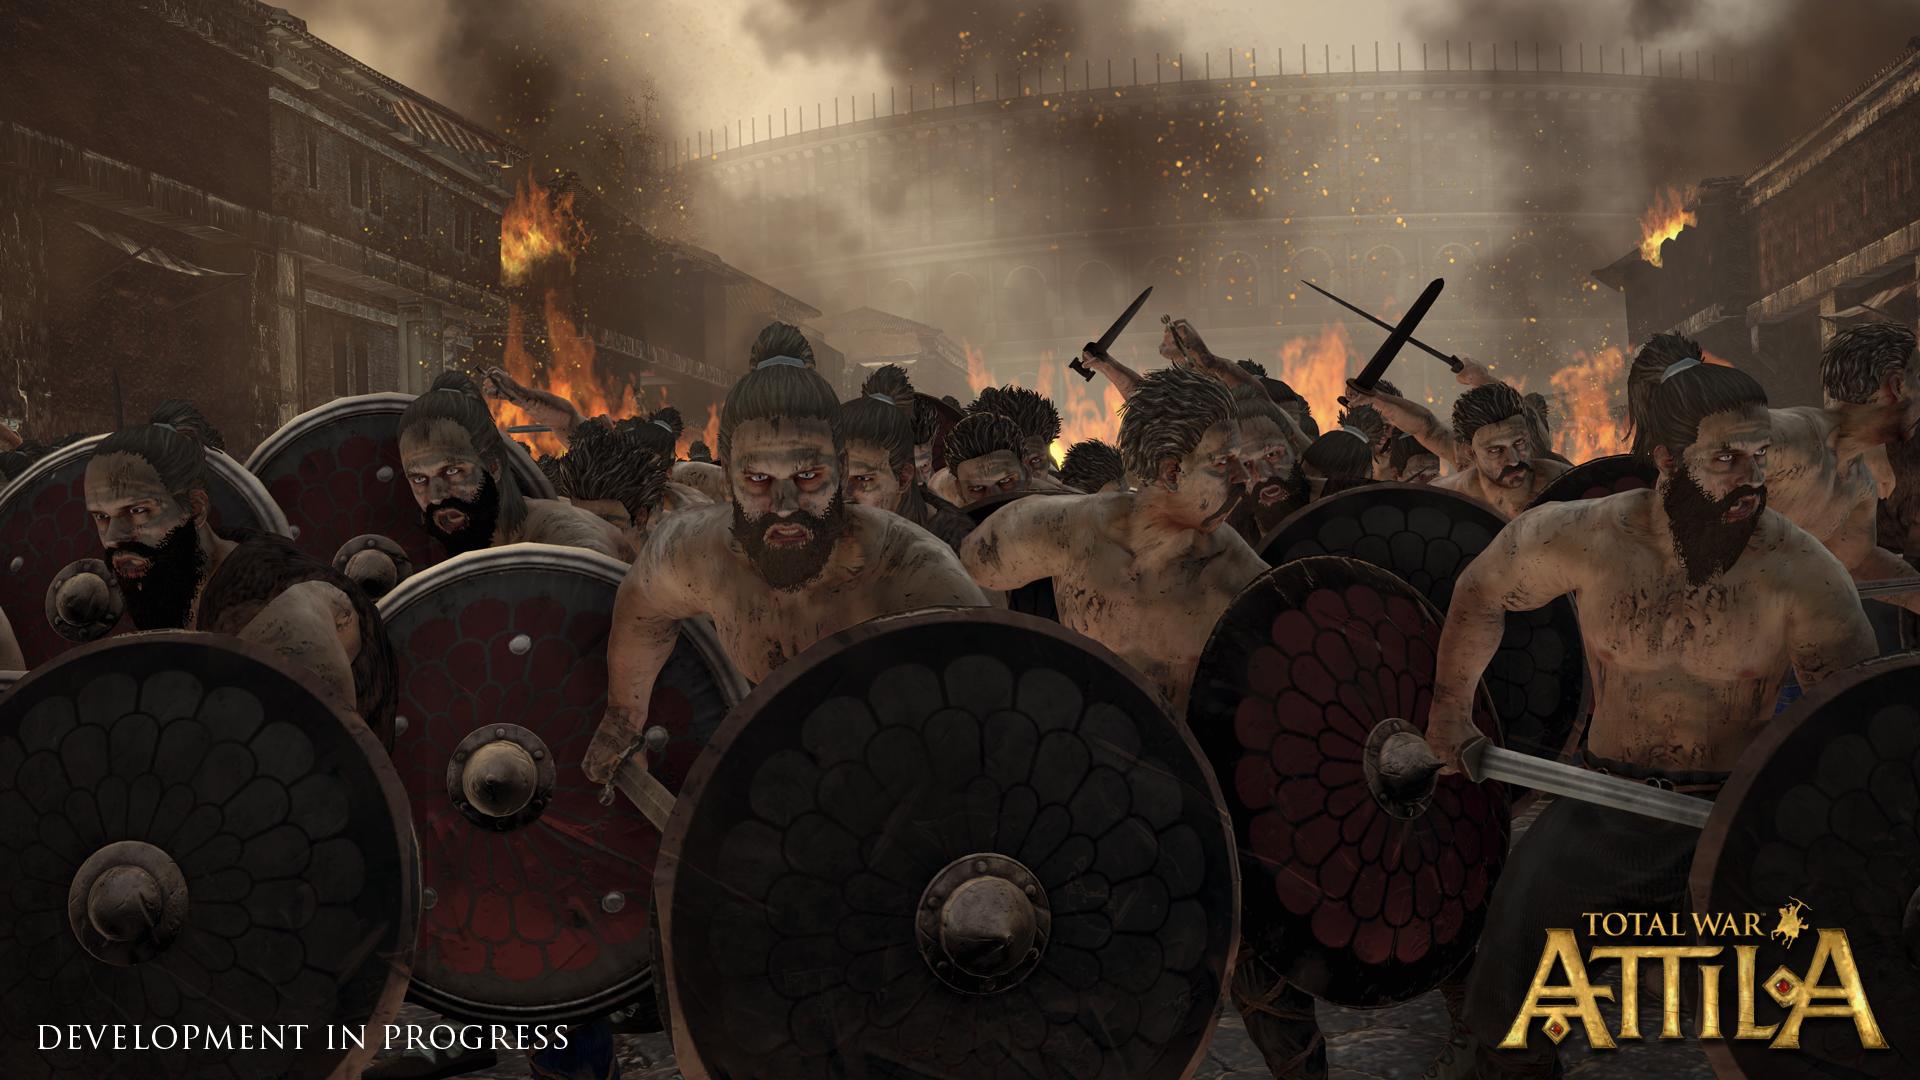 Seznam frakcí v Total War Attila 102634